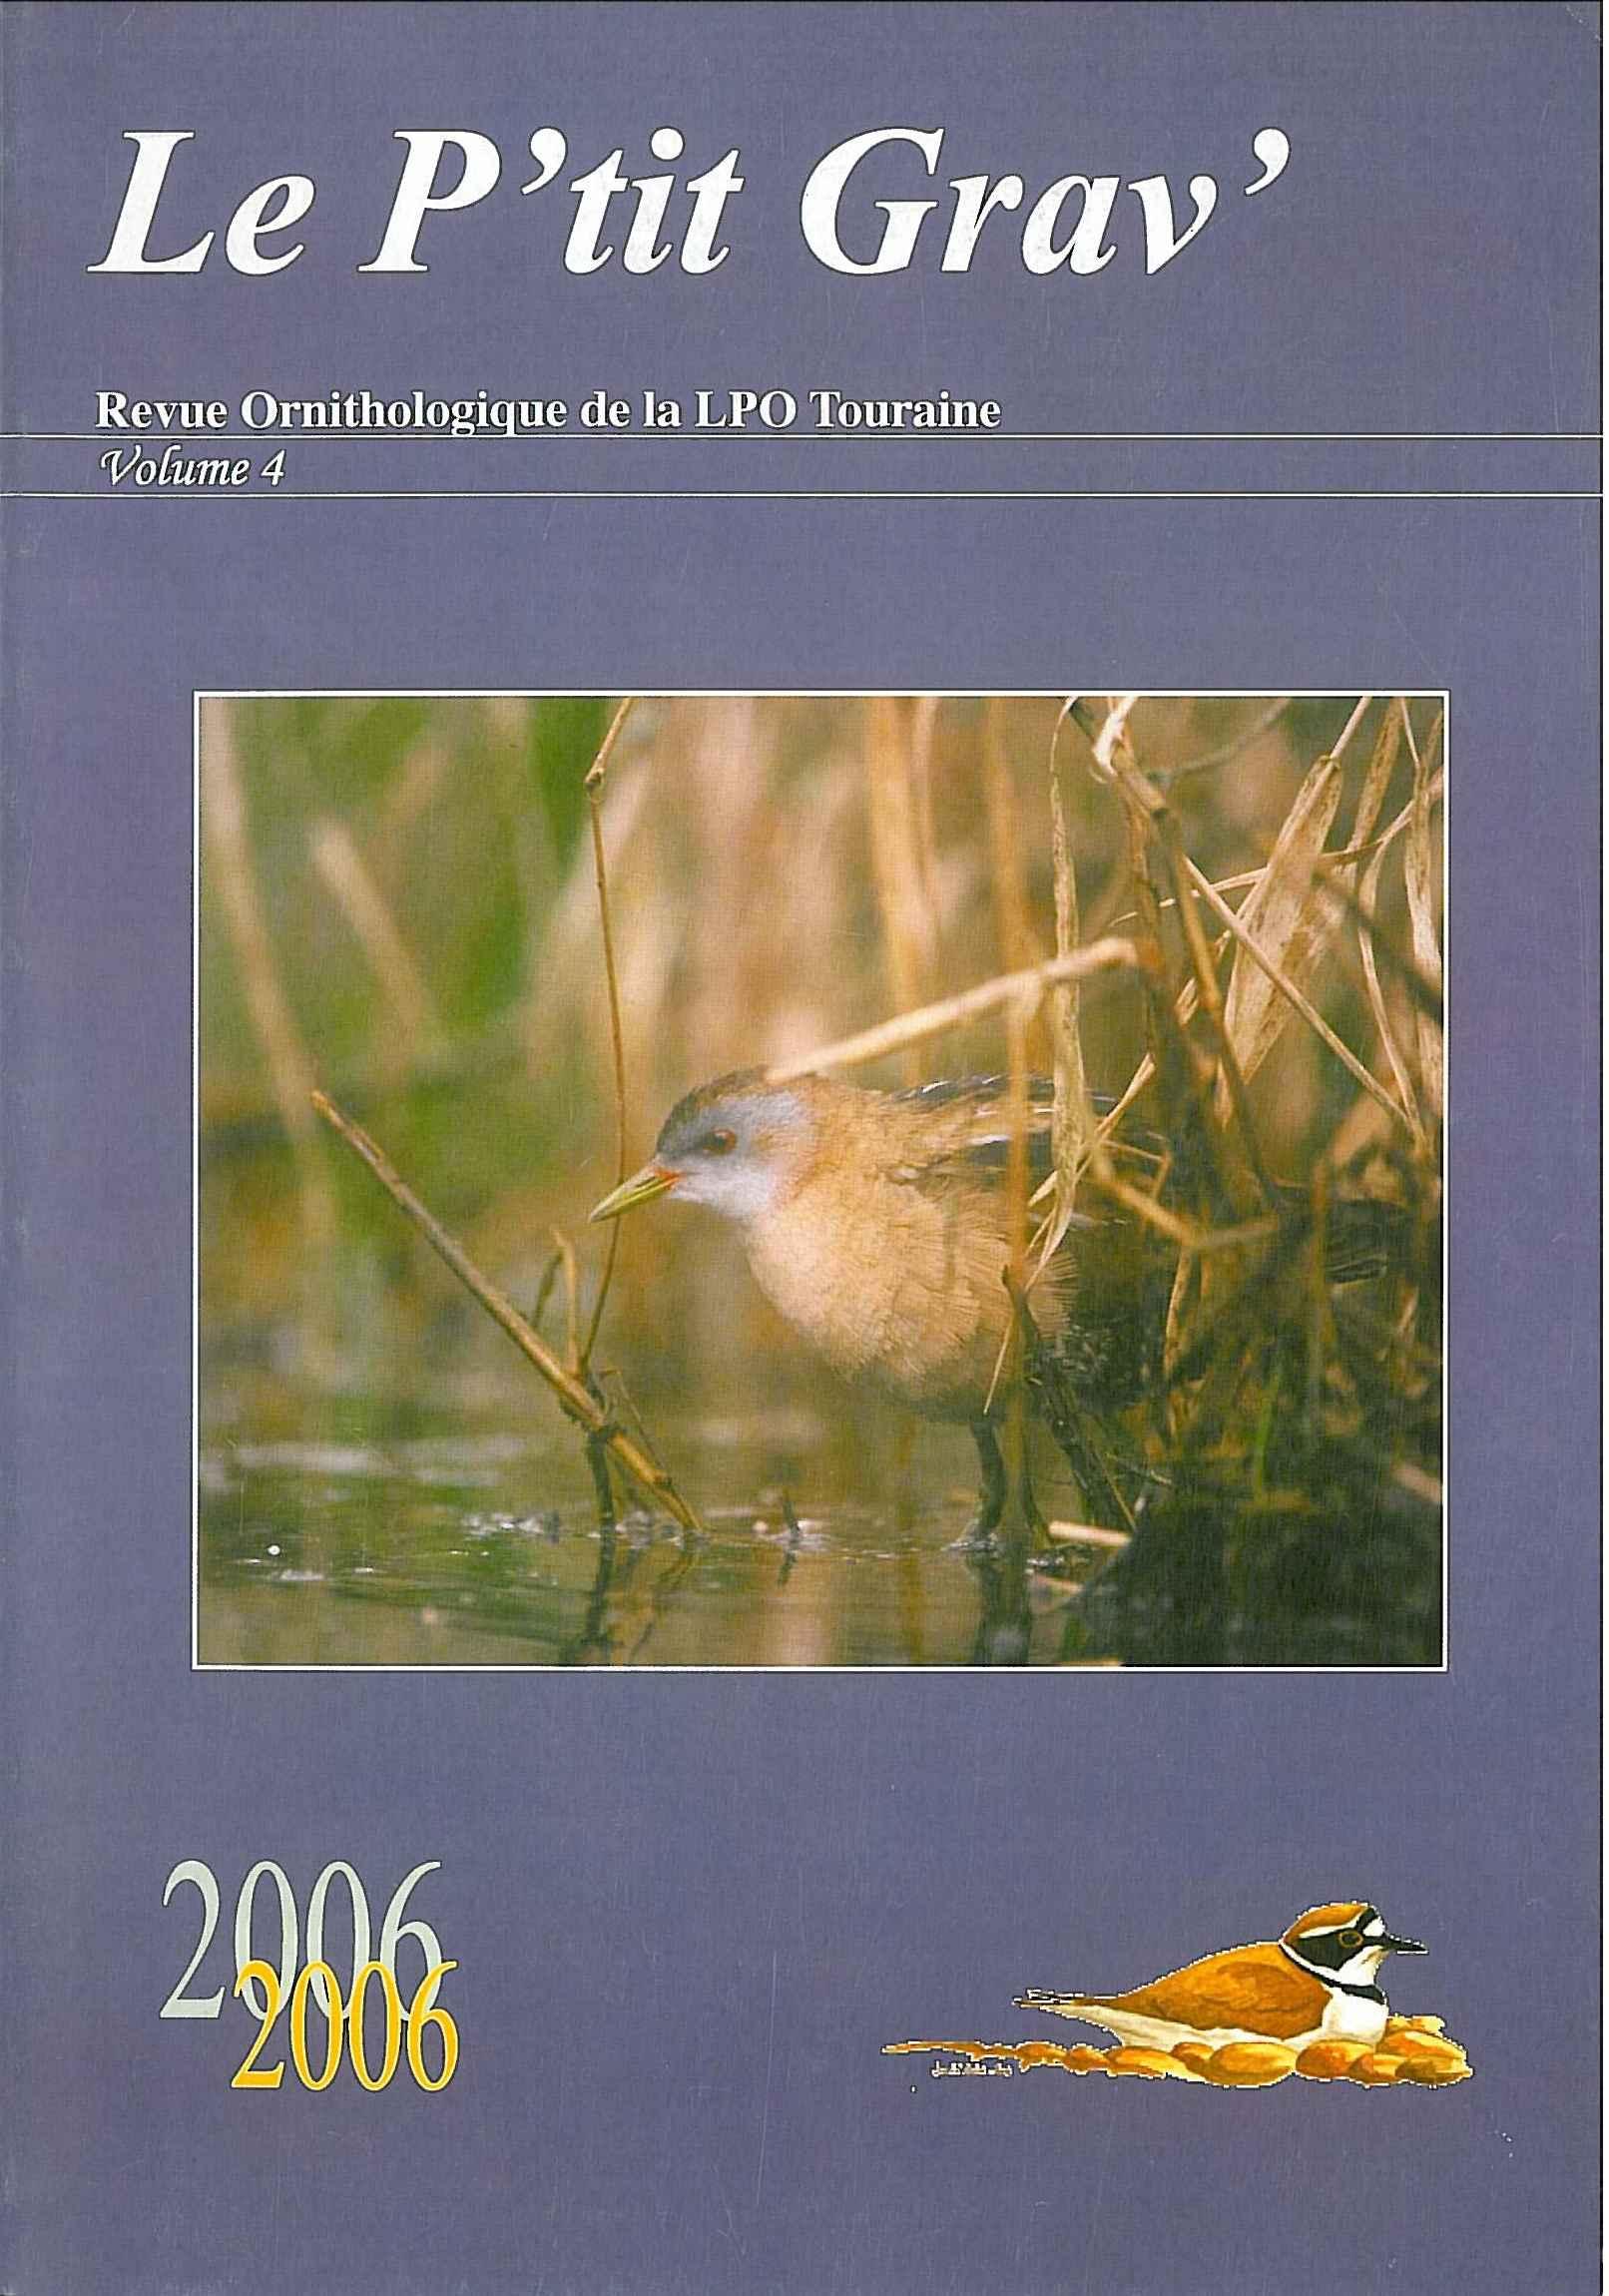 https://cdnfiles1.biolovision.net/www.faune-touraine.org/userfiles/MonDossier/PtitGravvol4.jpg